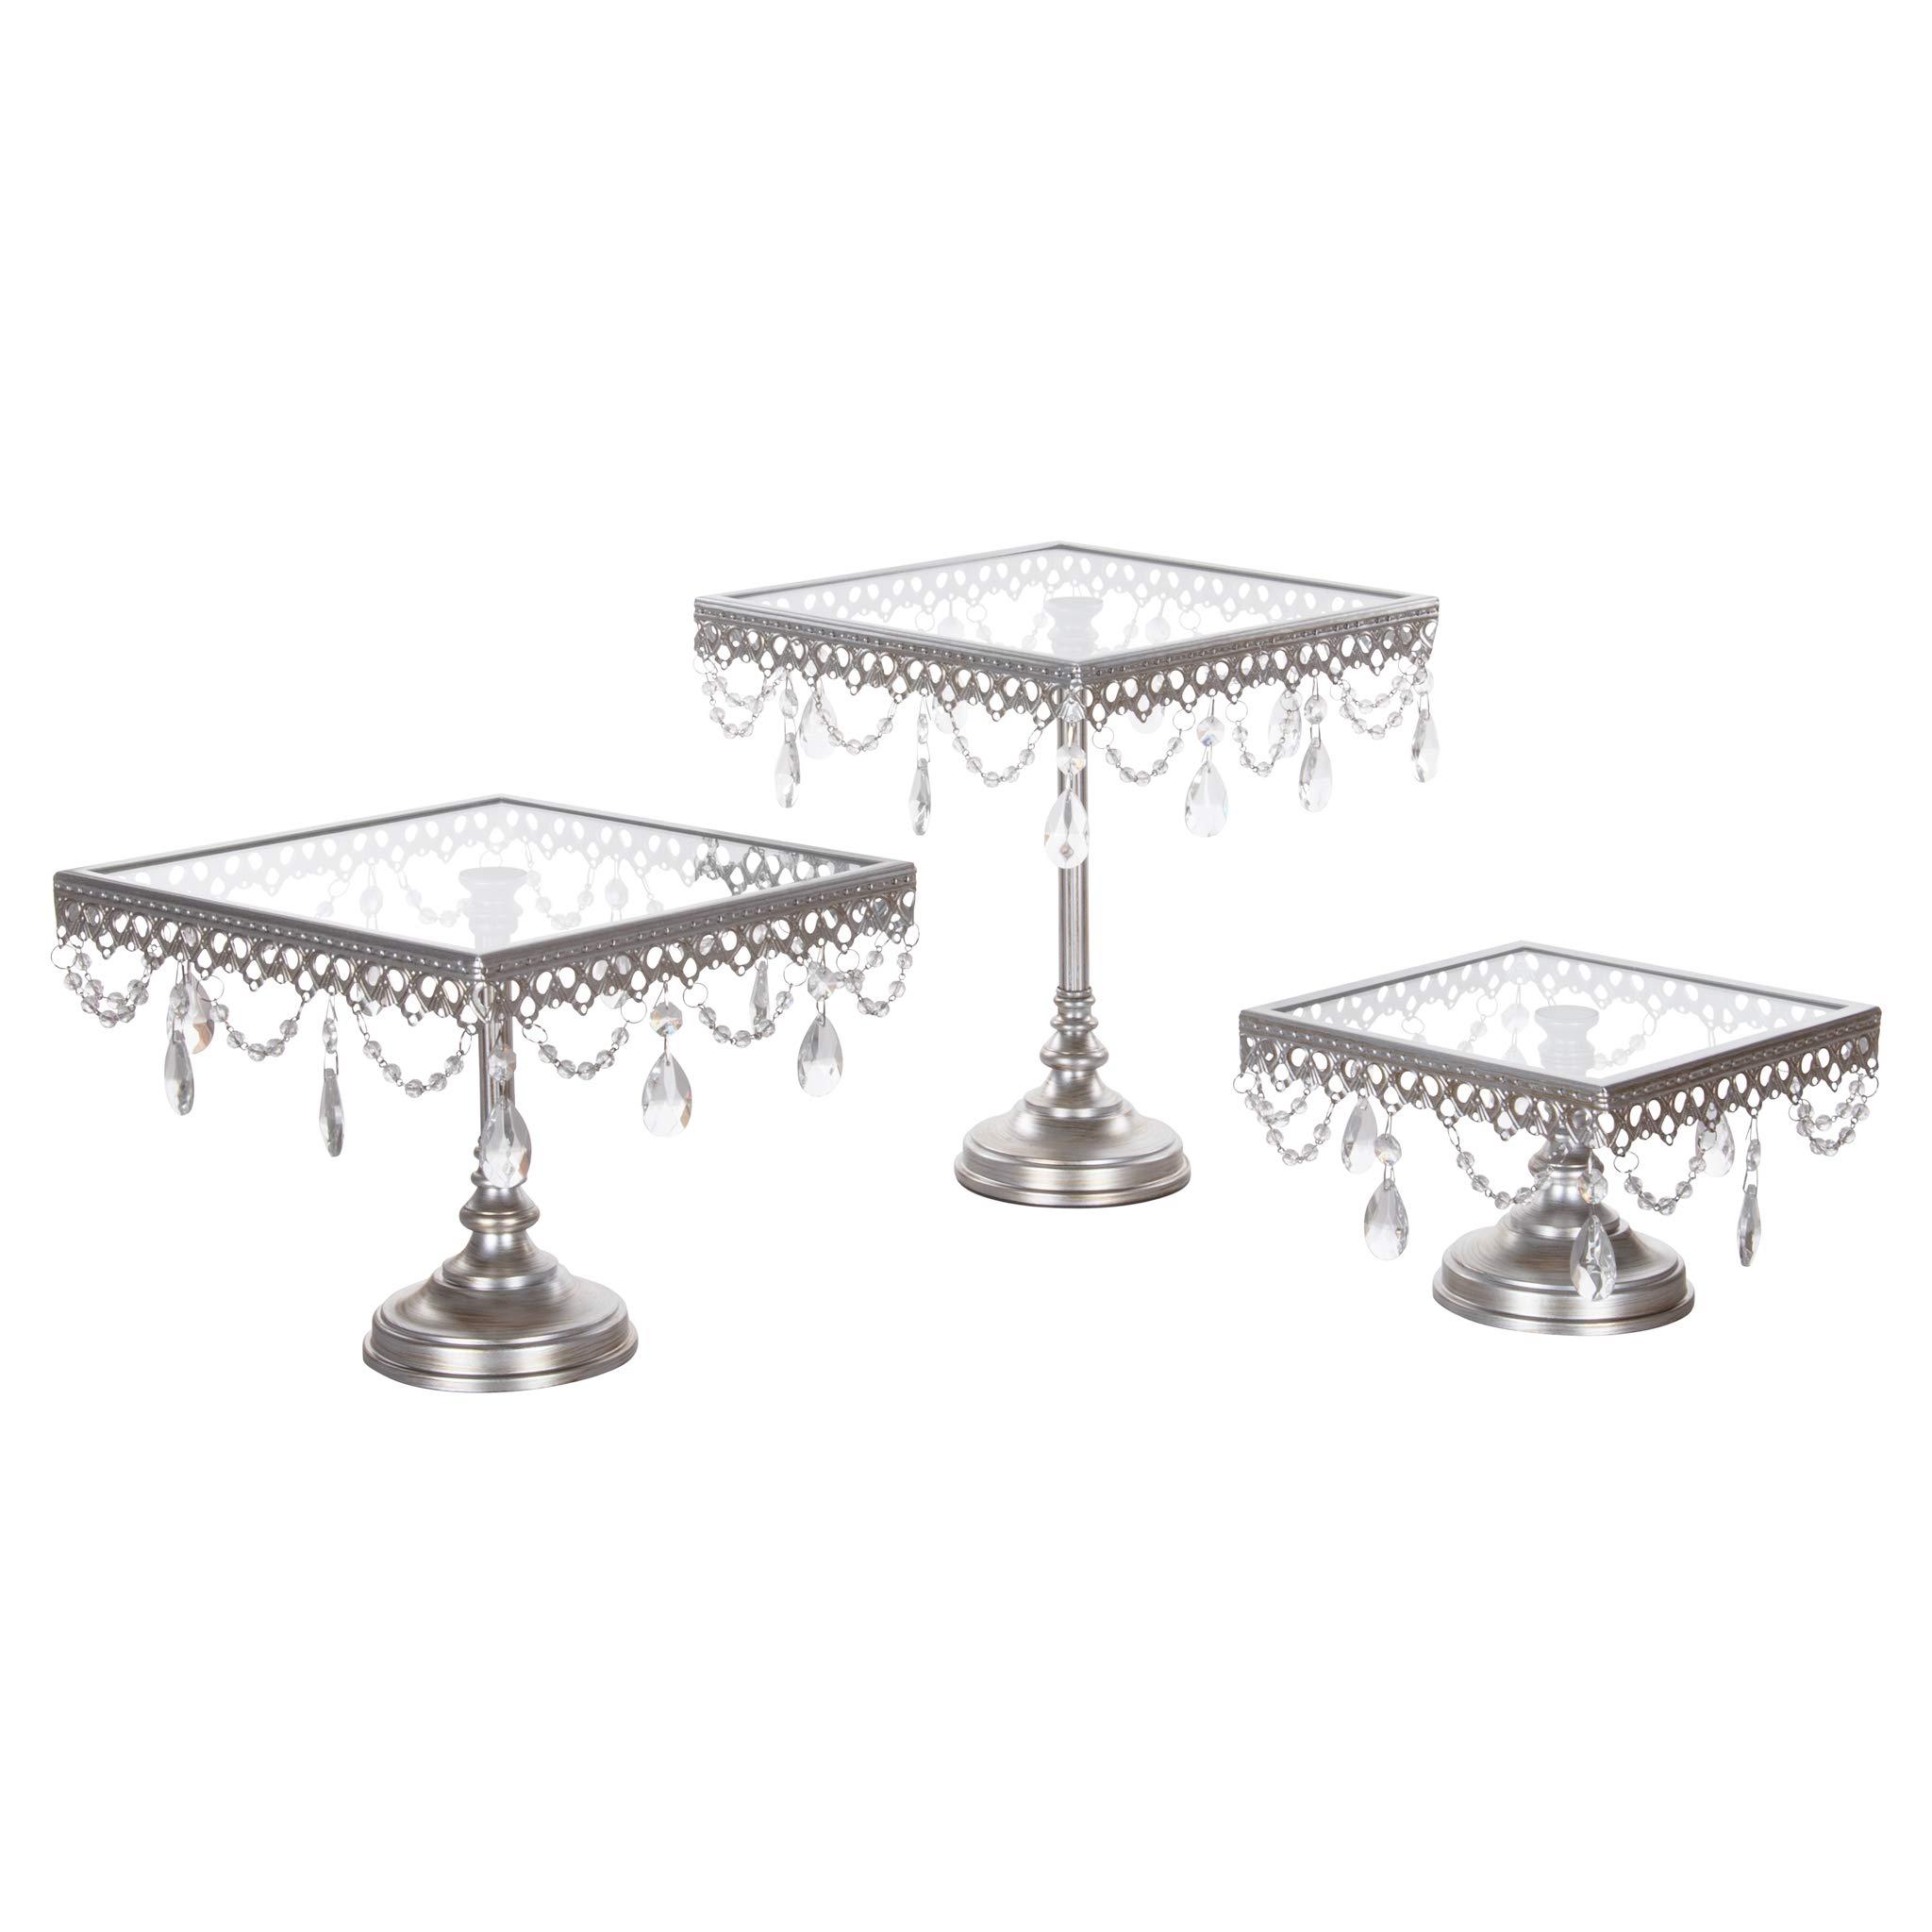 Amalfi Decor Glass-Top Square Cake Stand Set of 3, Dessert Cupcake Wedding Event Party Birthday Metal Display Pedestal (Silver)